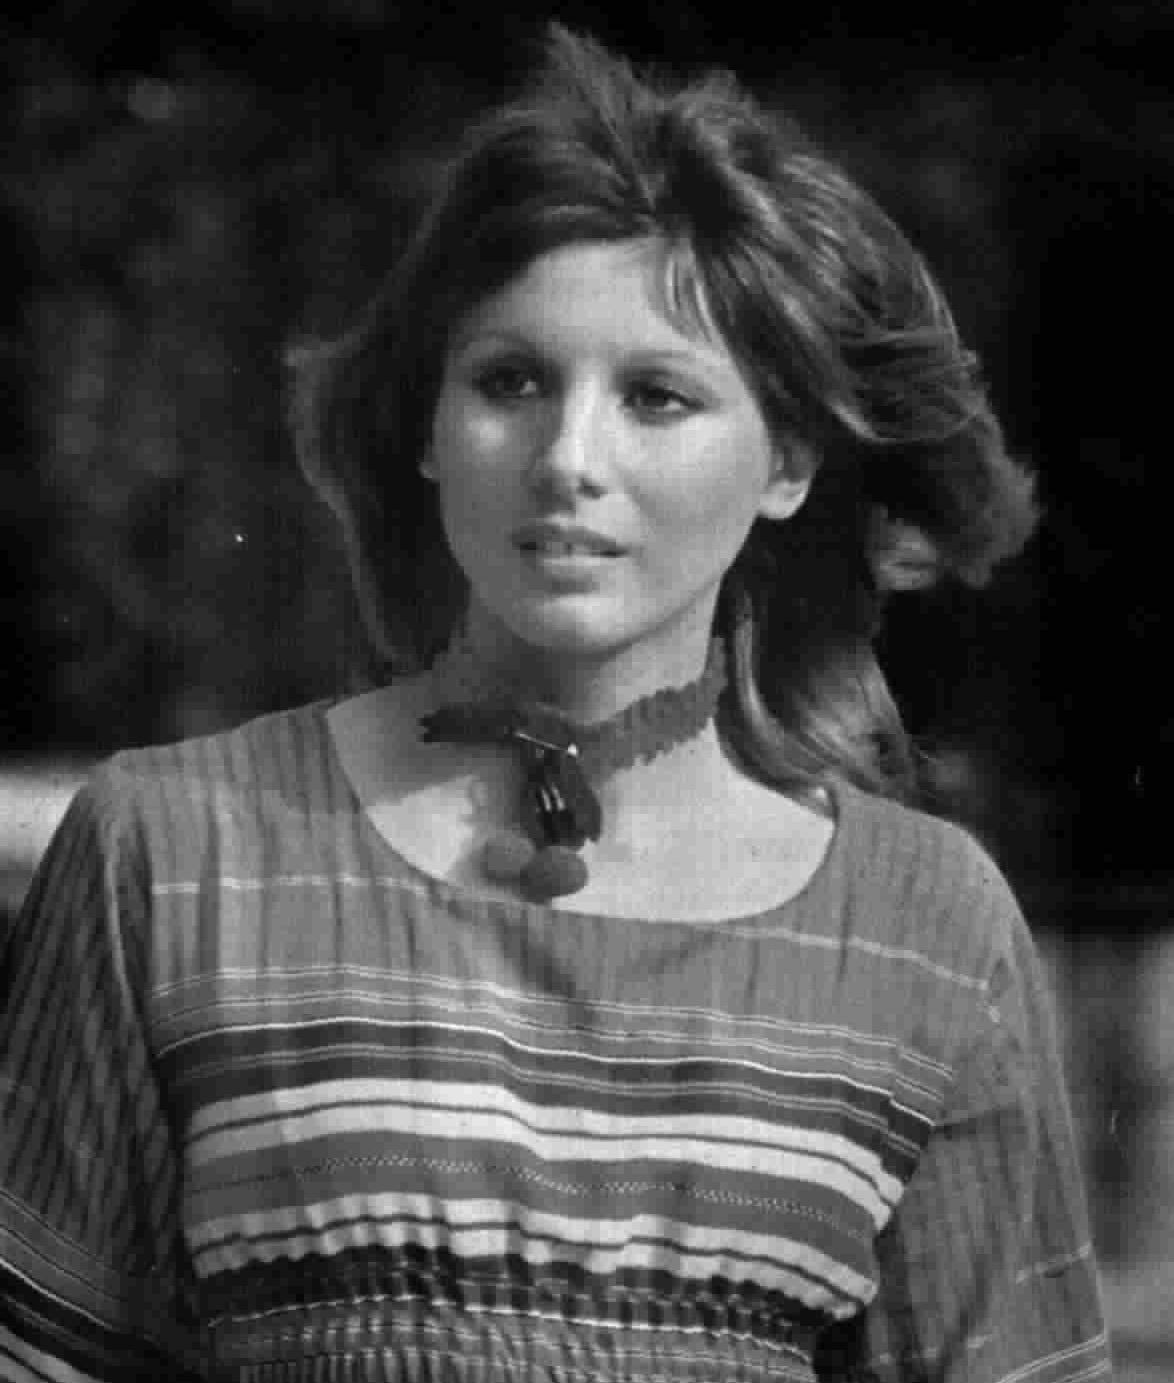 Paola Pitagora (born 1941)